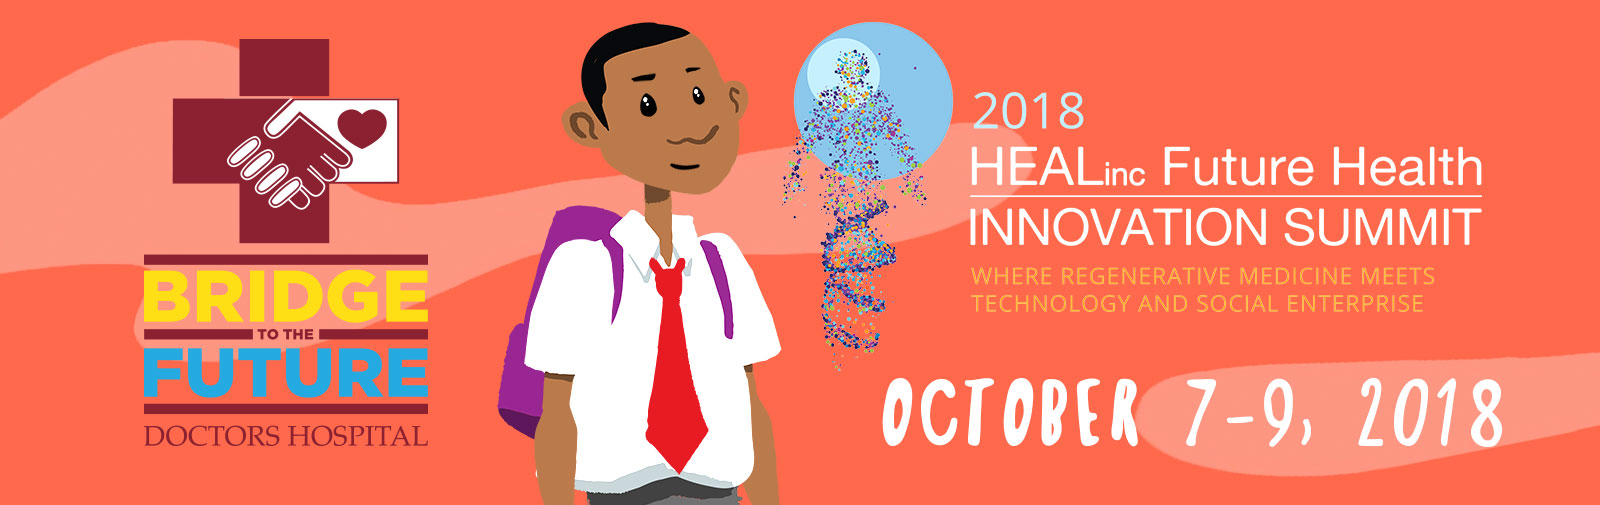 2018 Inaugural Healinc Future Health Innovation Summit